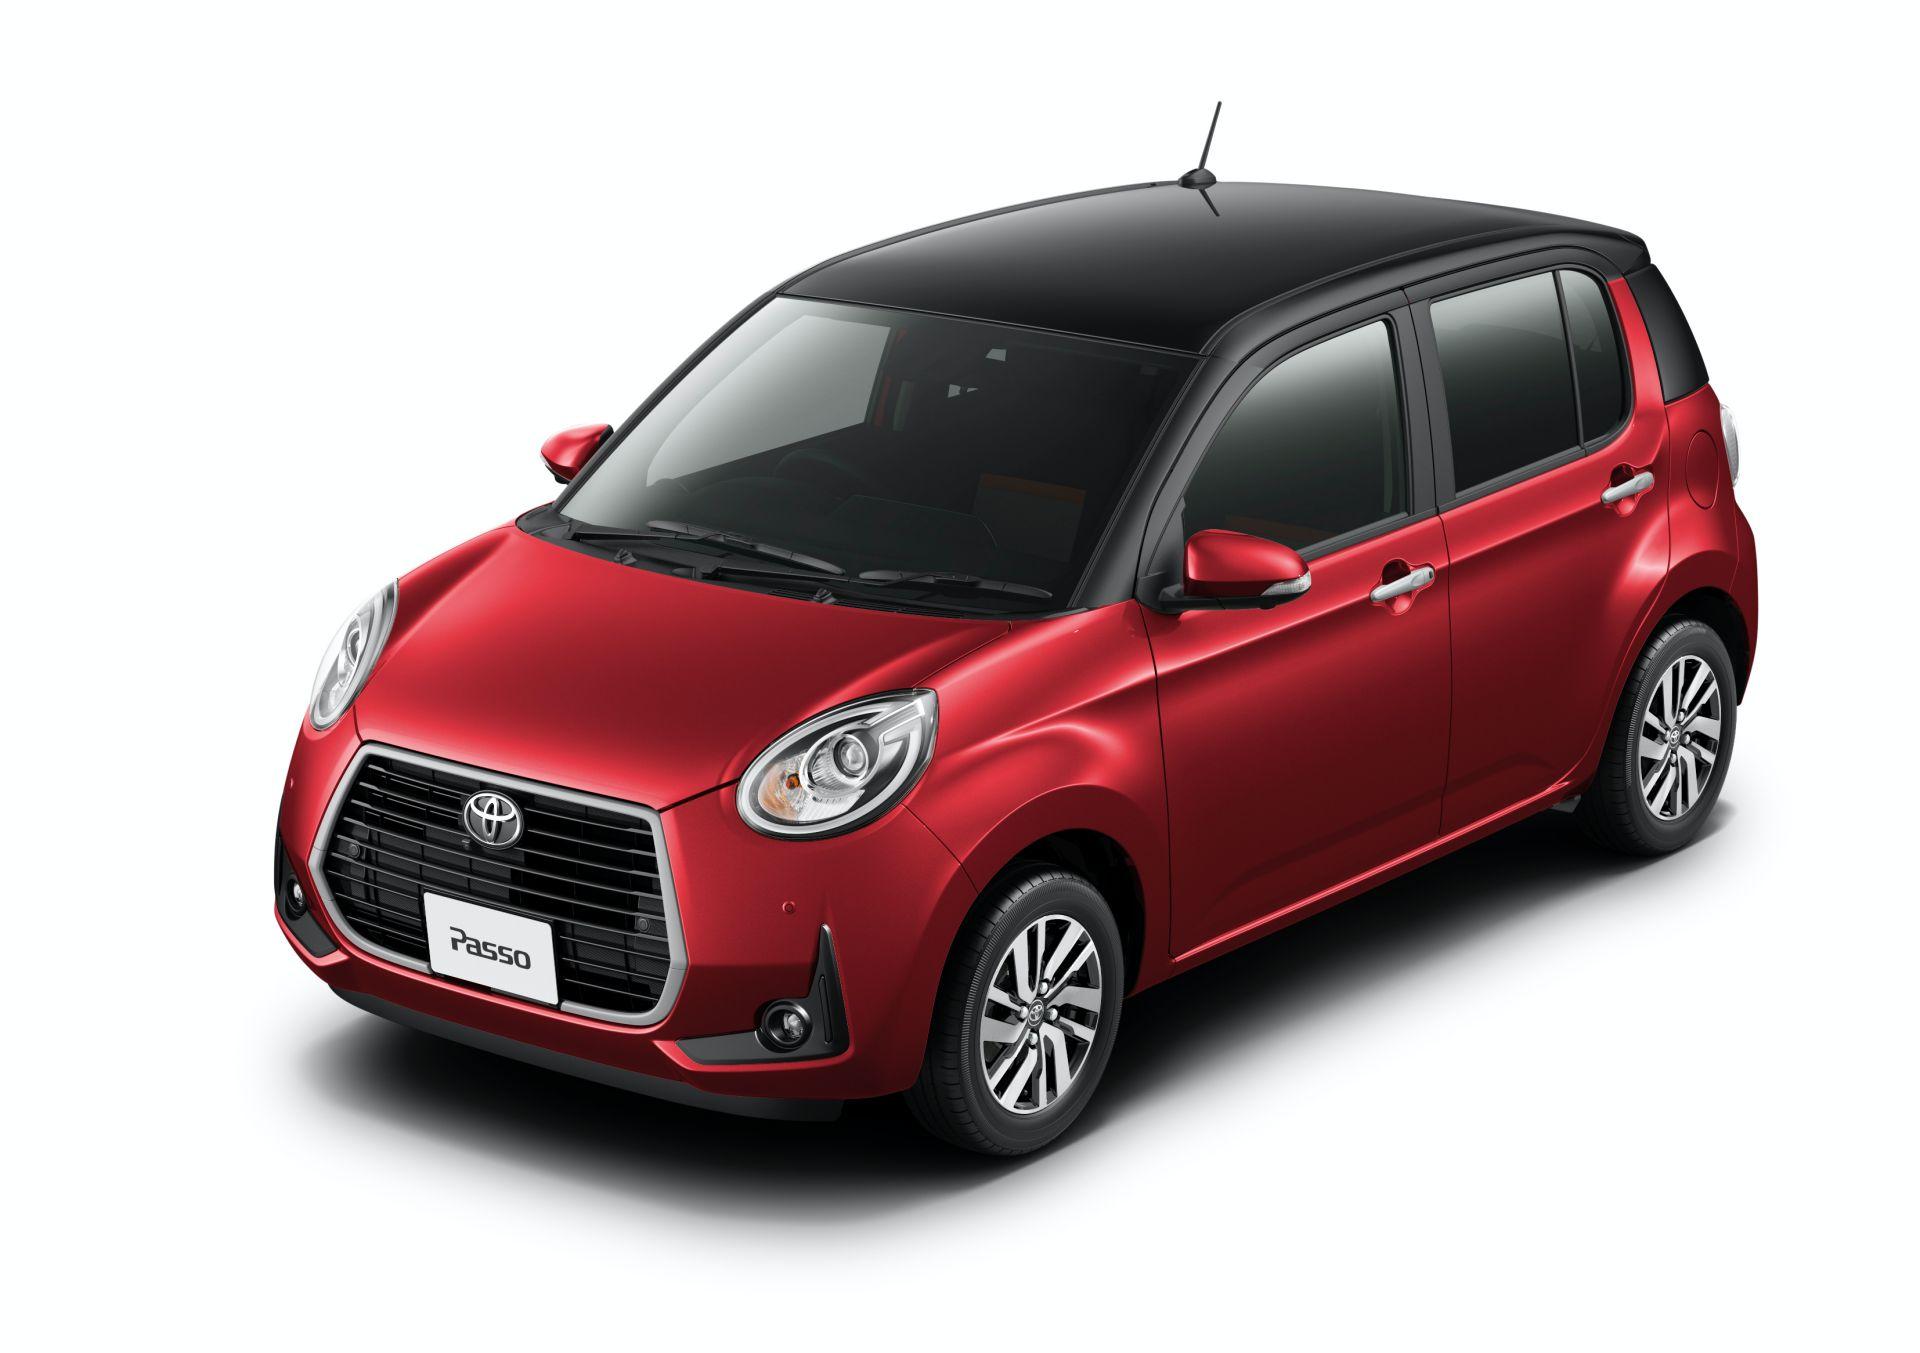 Toyota_Passo_Moda_Charm_0009